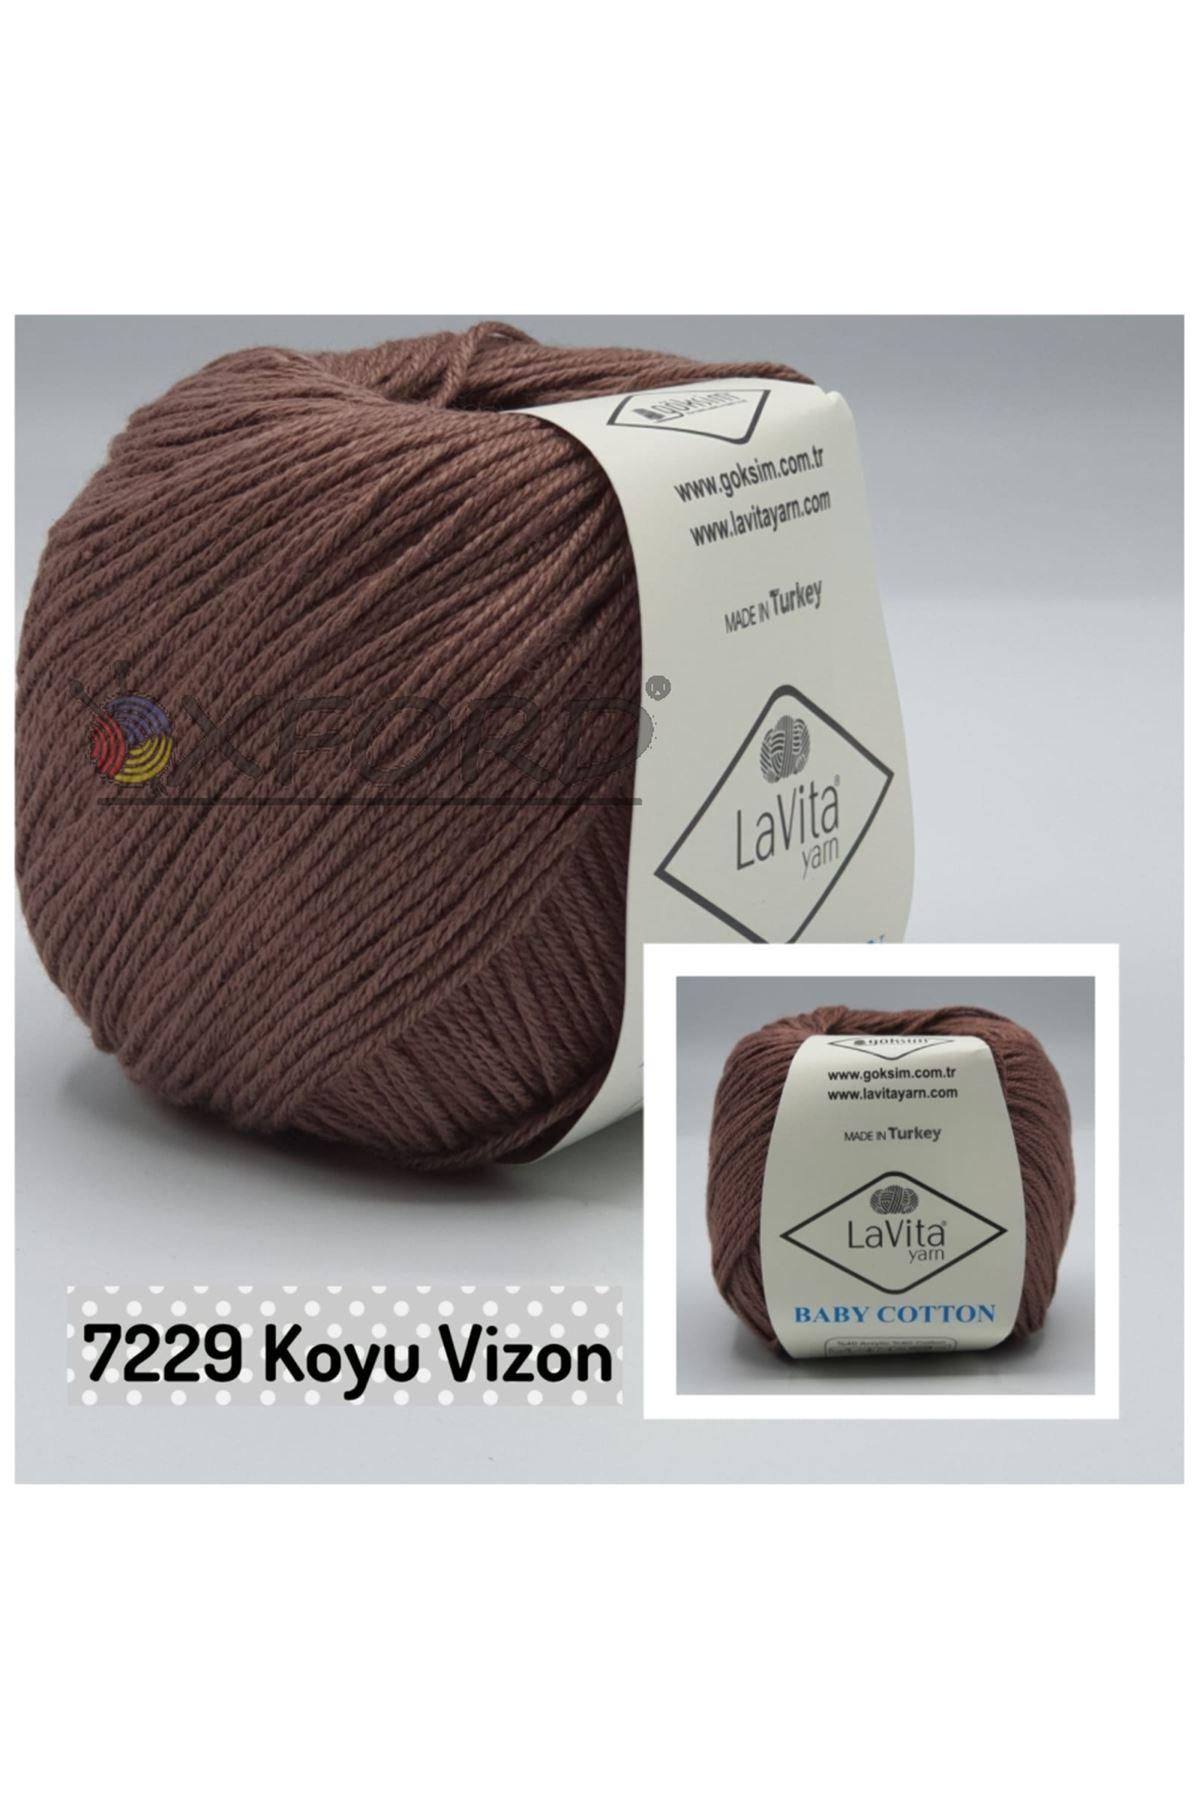 Lavita Baby Cotton 7229 Koyu Vizon